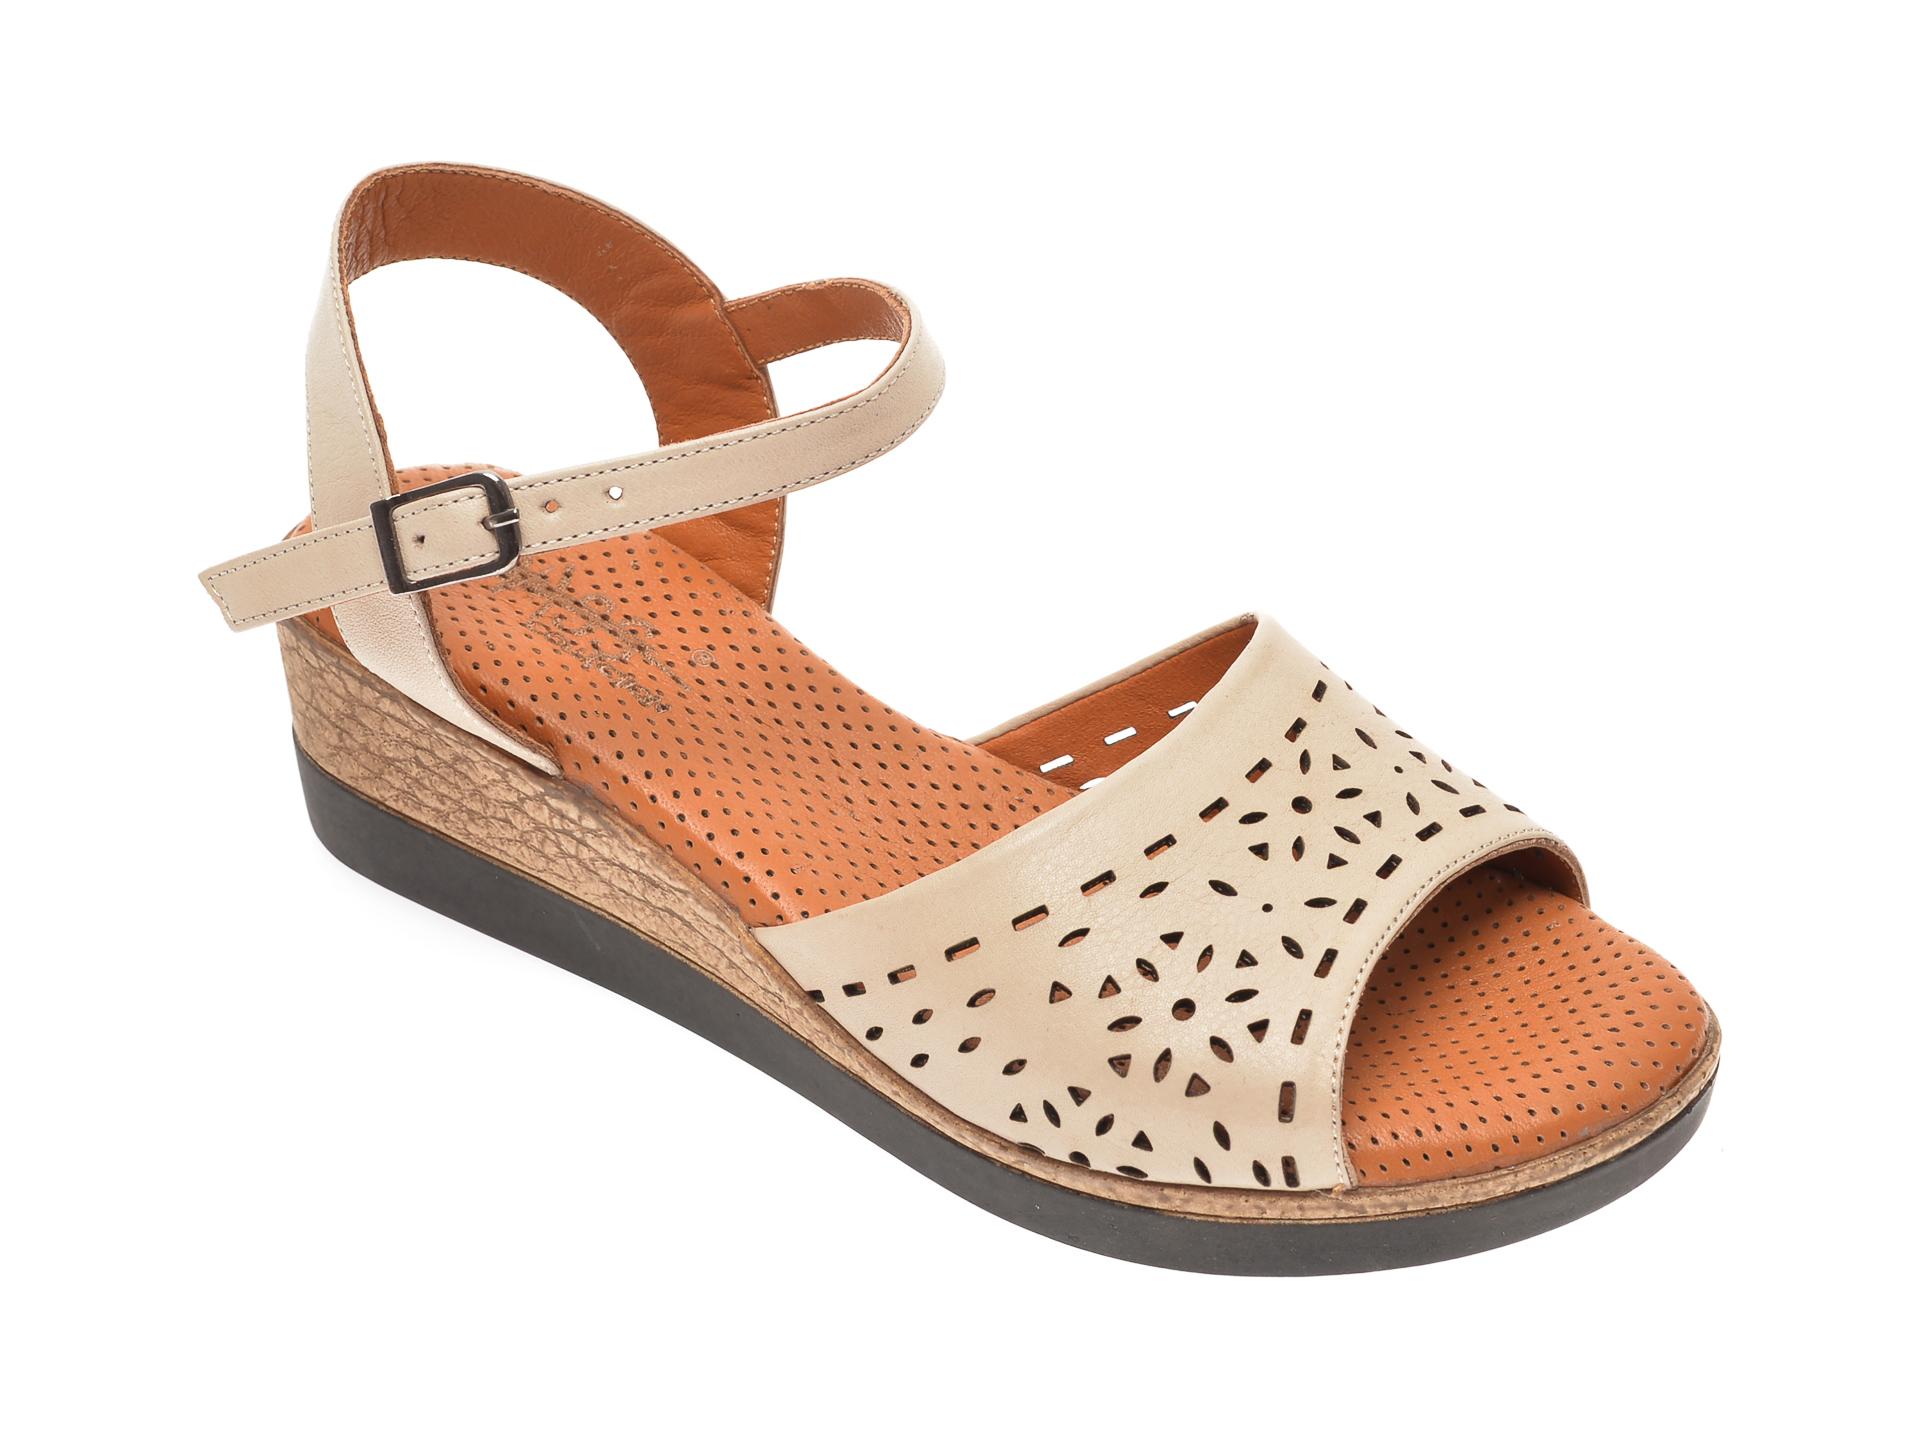 Sandale PASS COLLECTION bej, 2011, din piele naturala